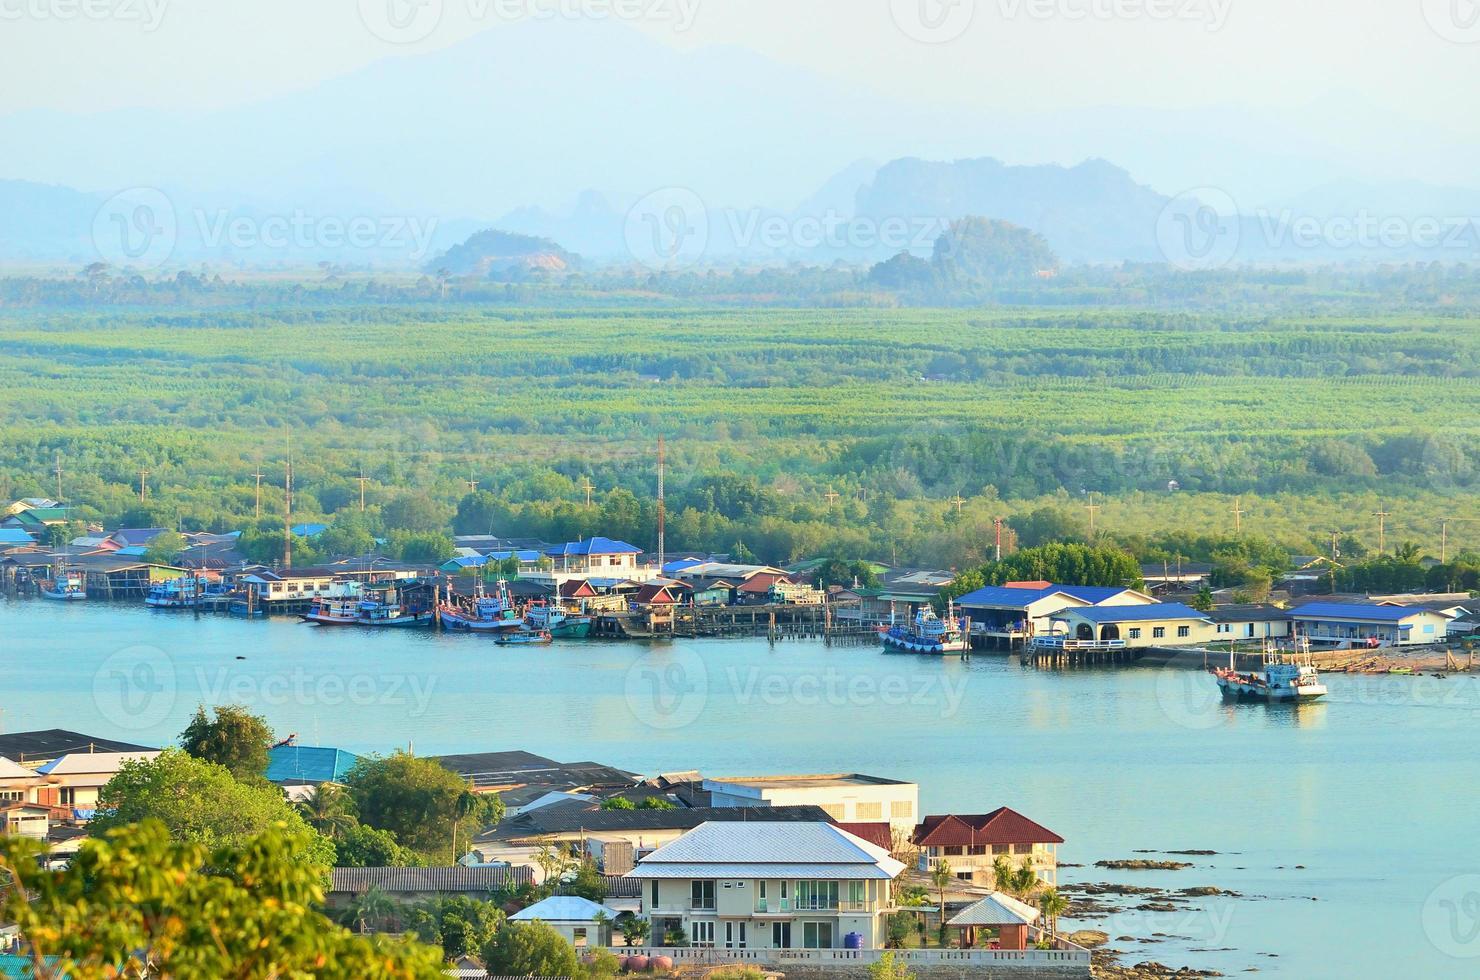 uitzicht punt surat thani op heuvel, thailand foto